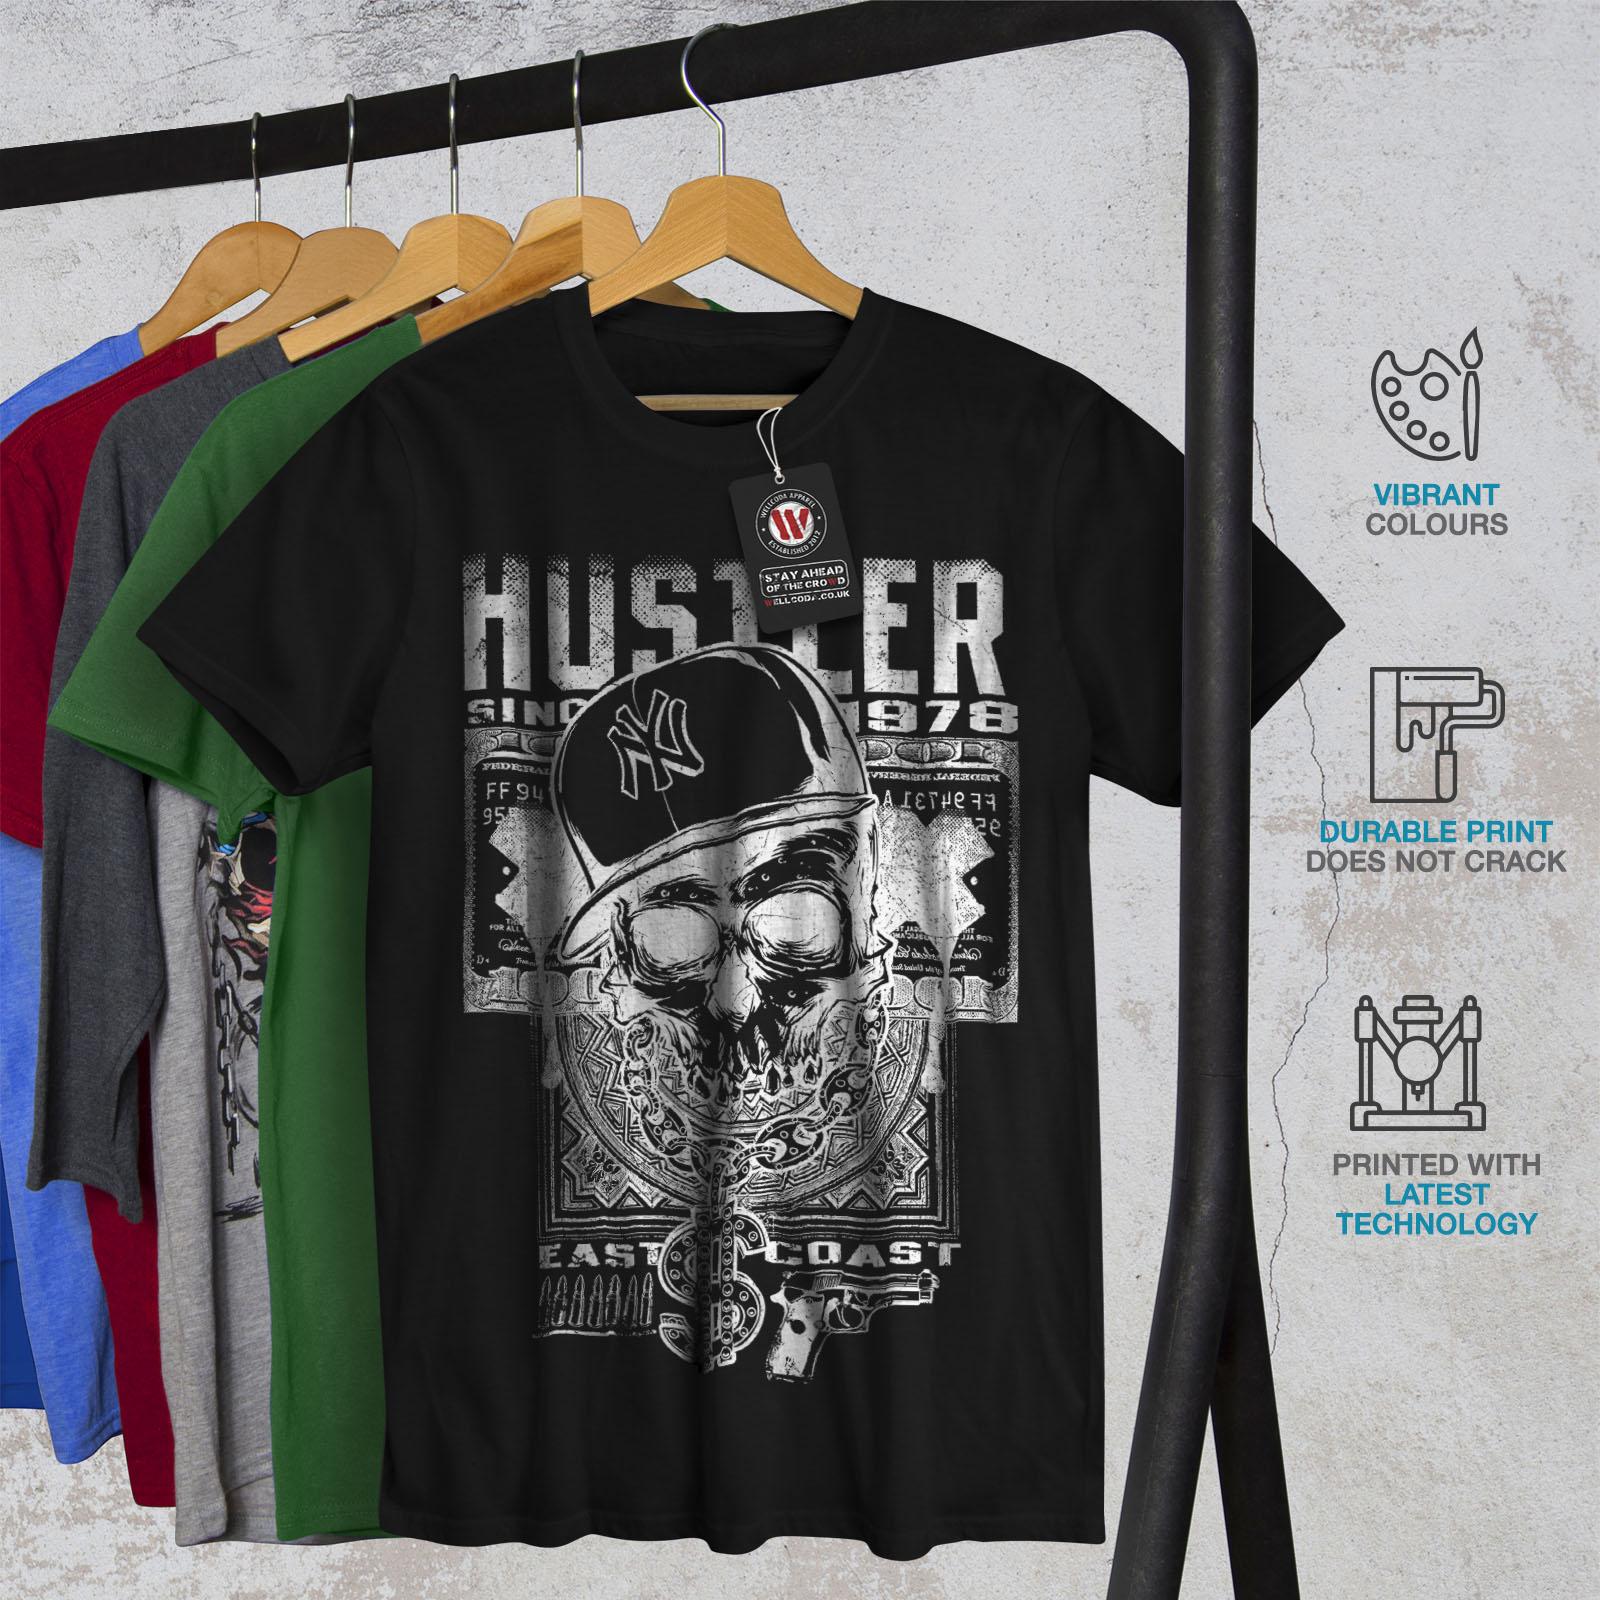 Wellcoda Bob Marley Serious Mens T-shirt Face Graphic Design Printed Tee